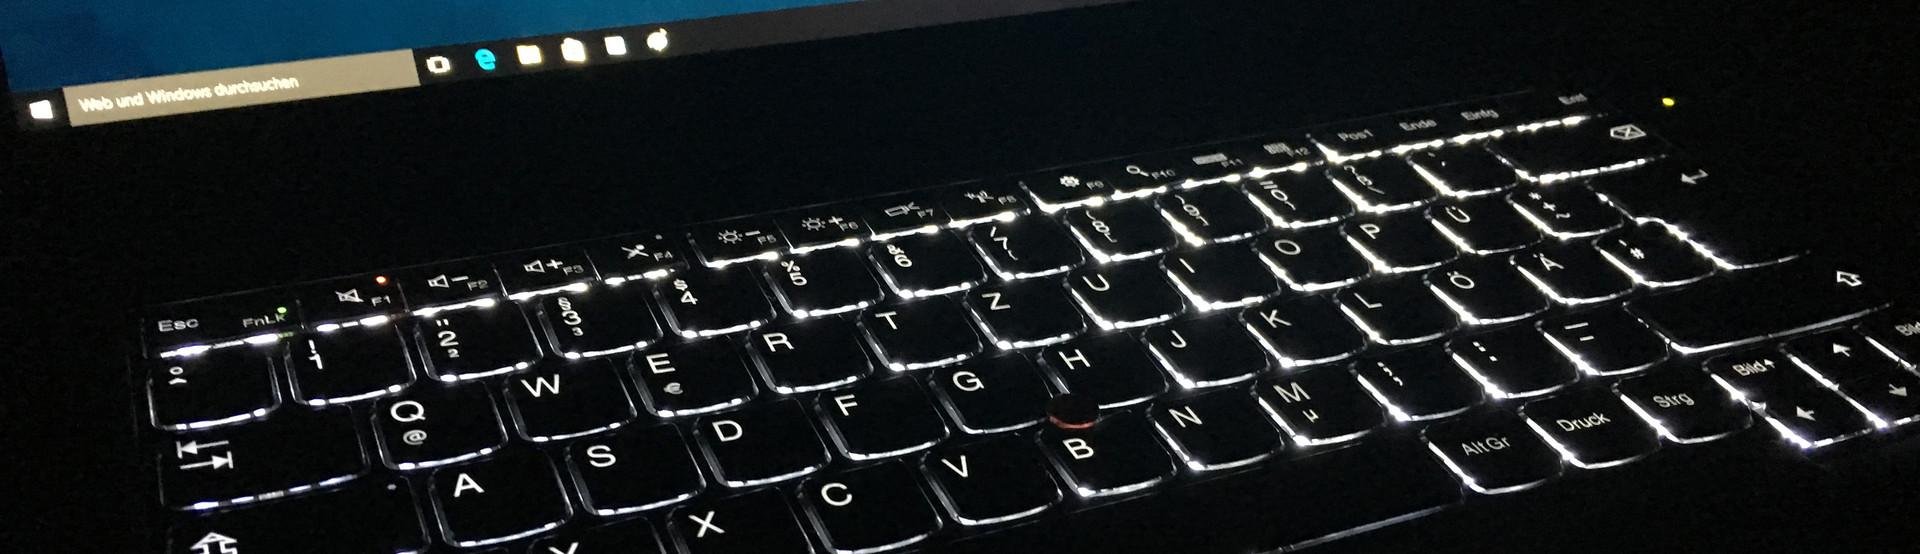 Lenovo Thinkpad T460s Core I5 Full Hd Ultrabook Review